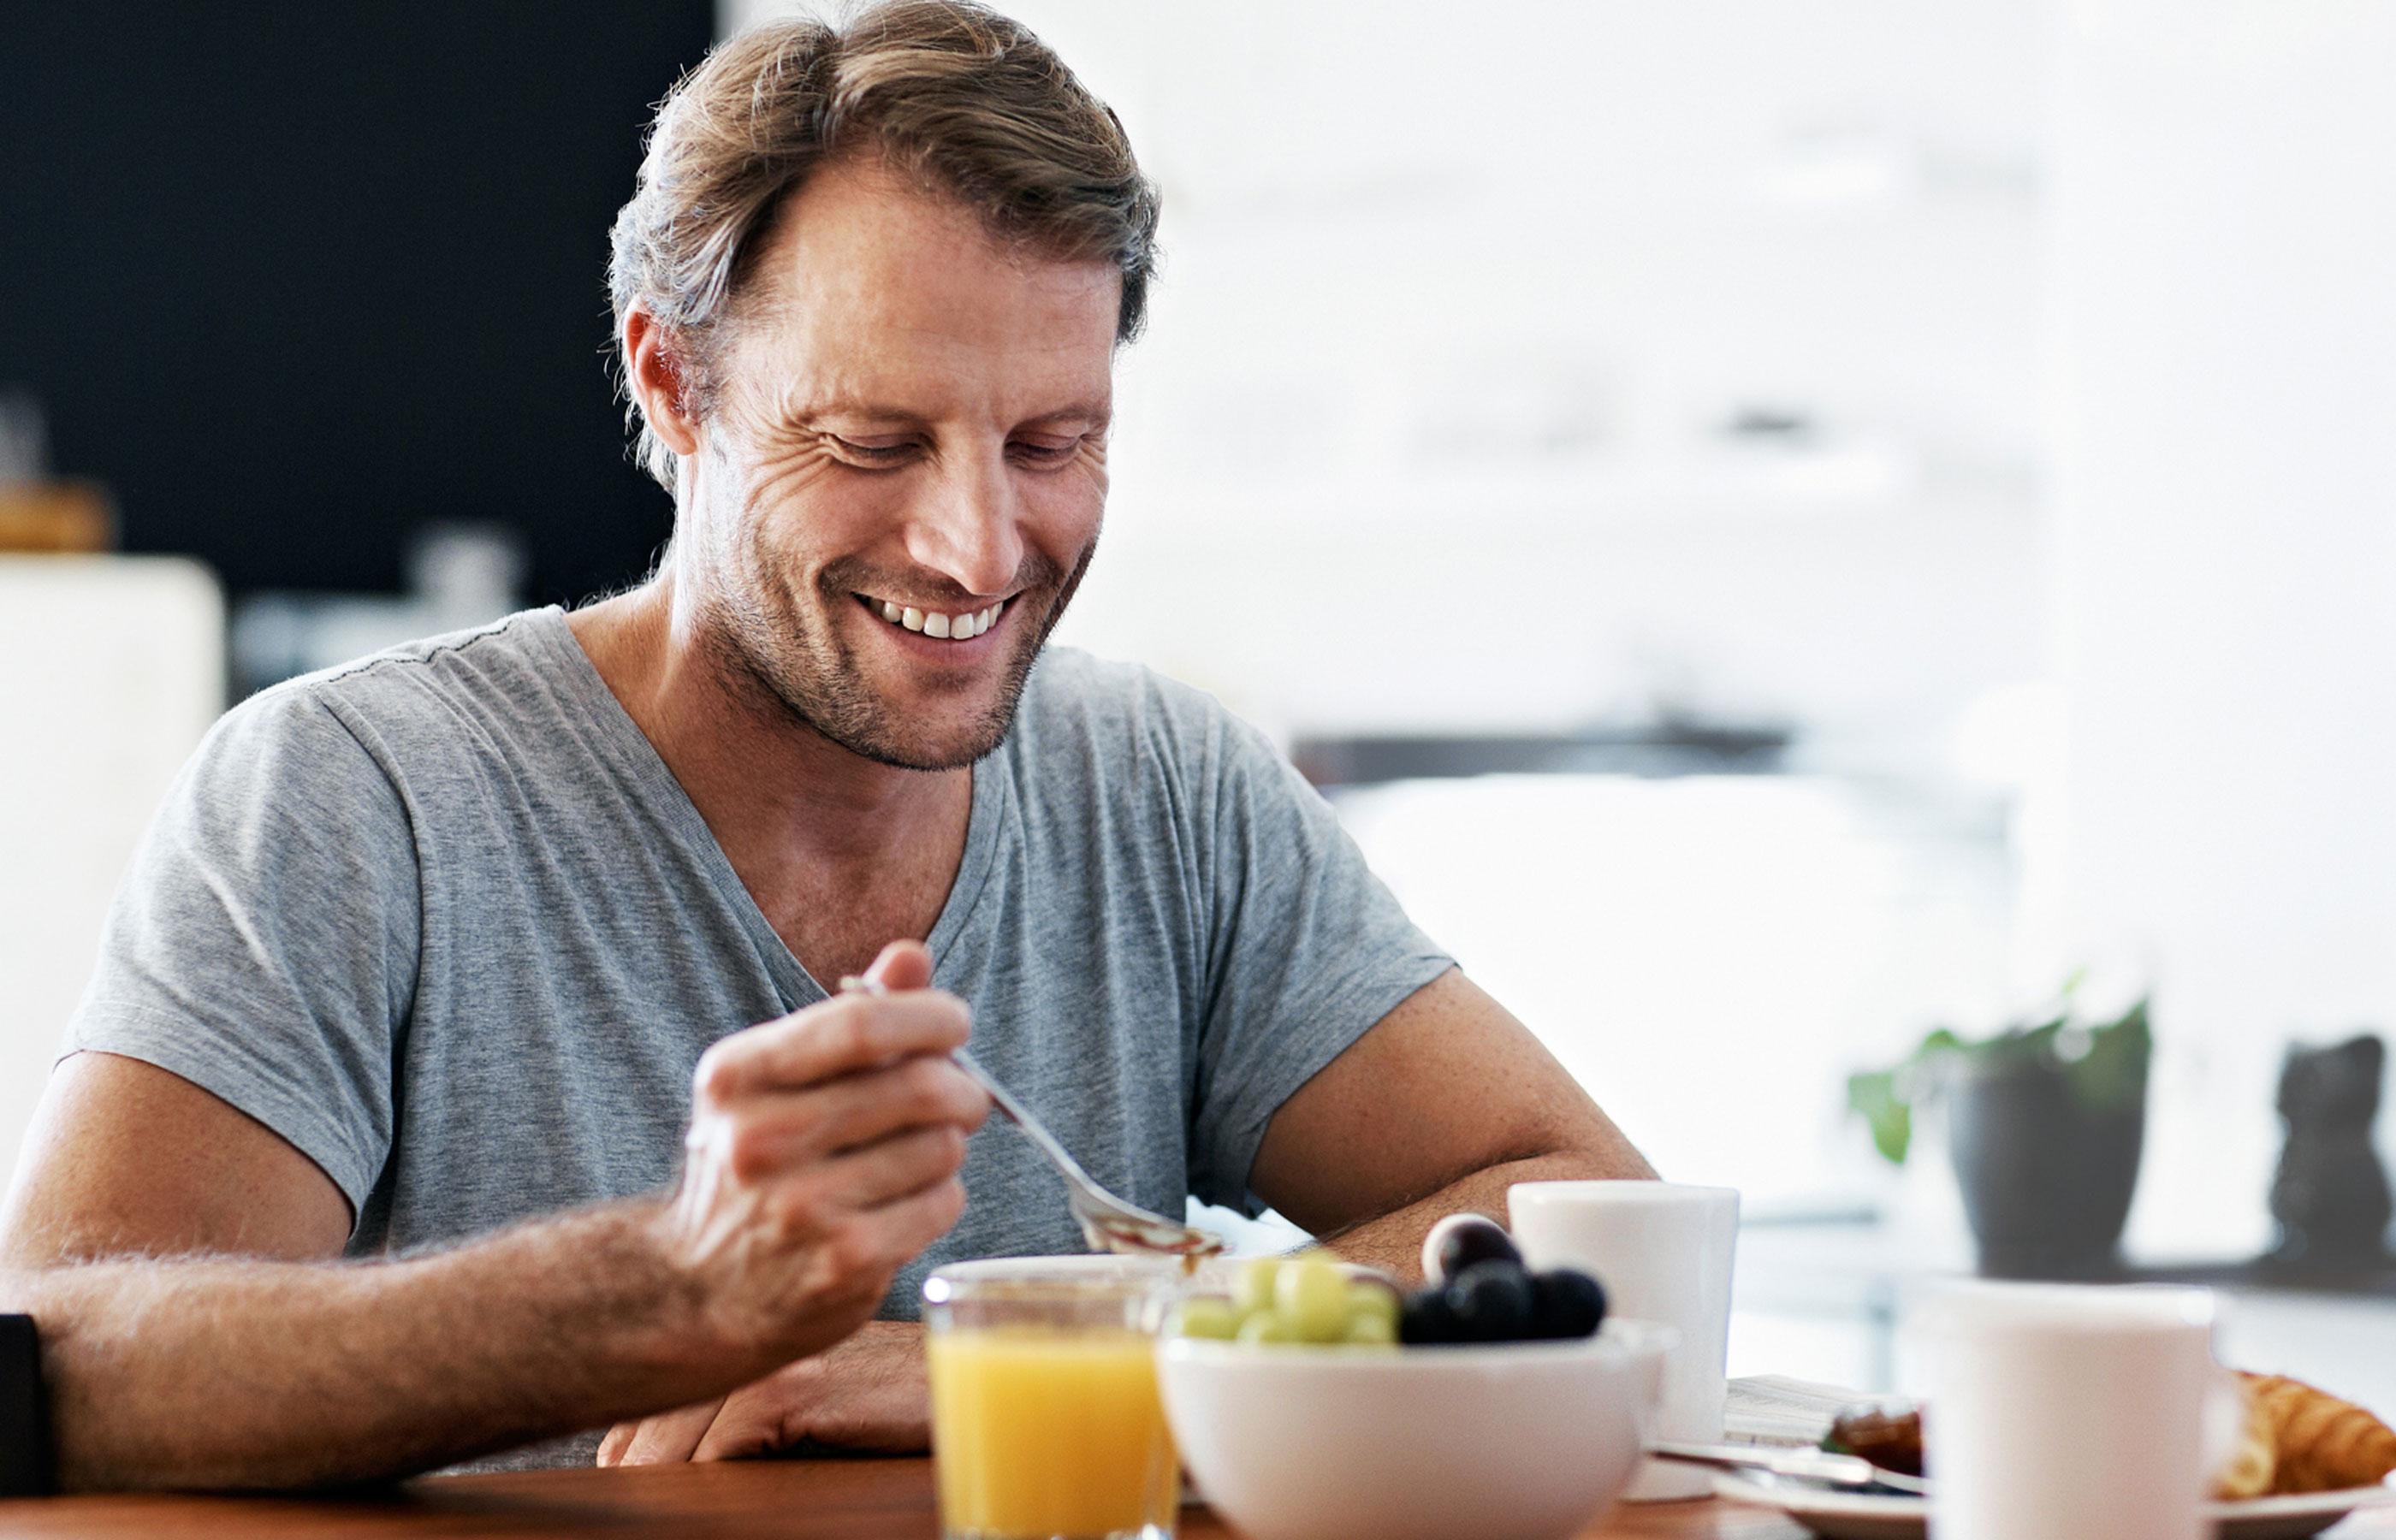 Кето-диета: польза и вред, правила питания и рацион